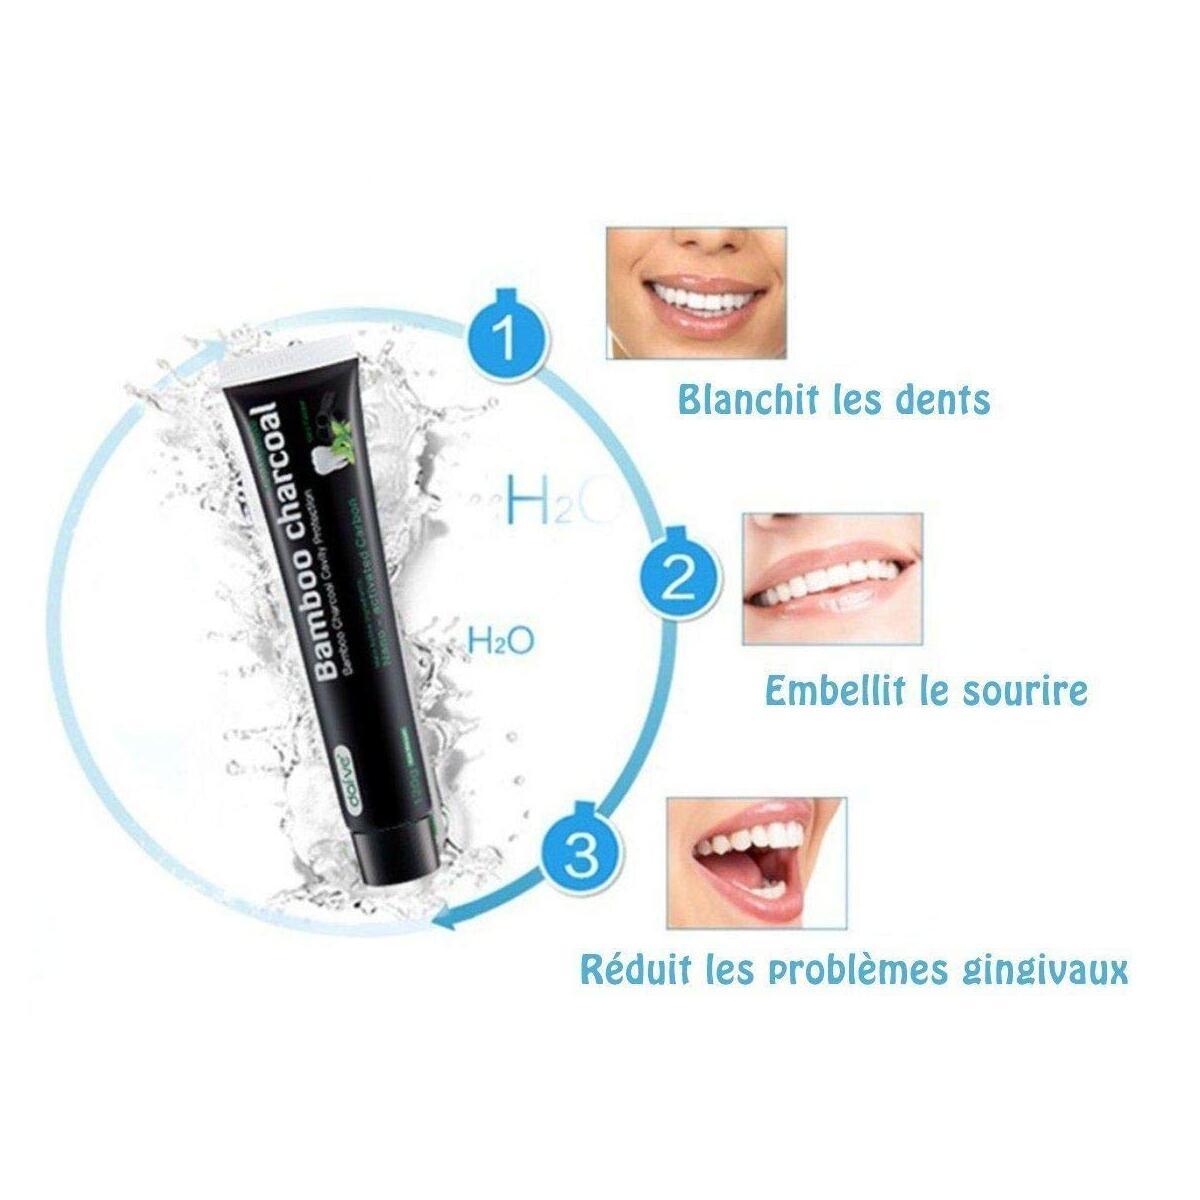 Bamboo Toothpaste - Organic Natural and Vegan